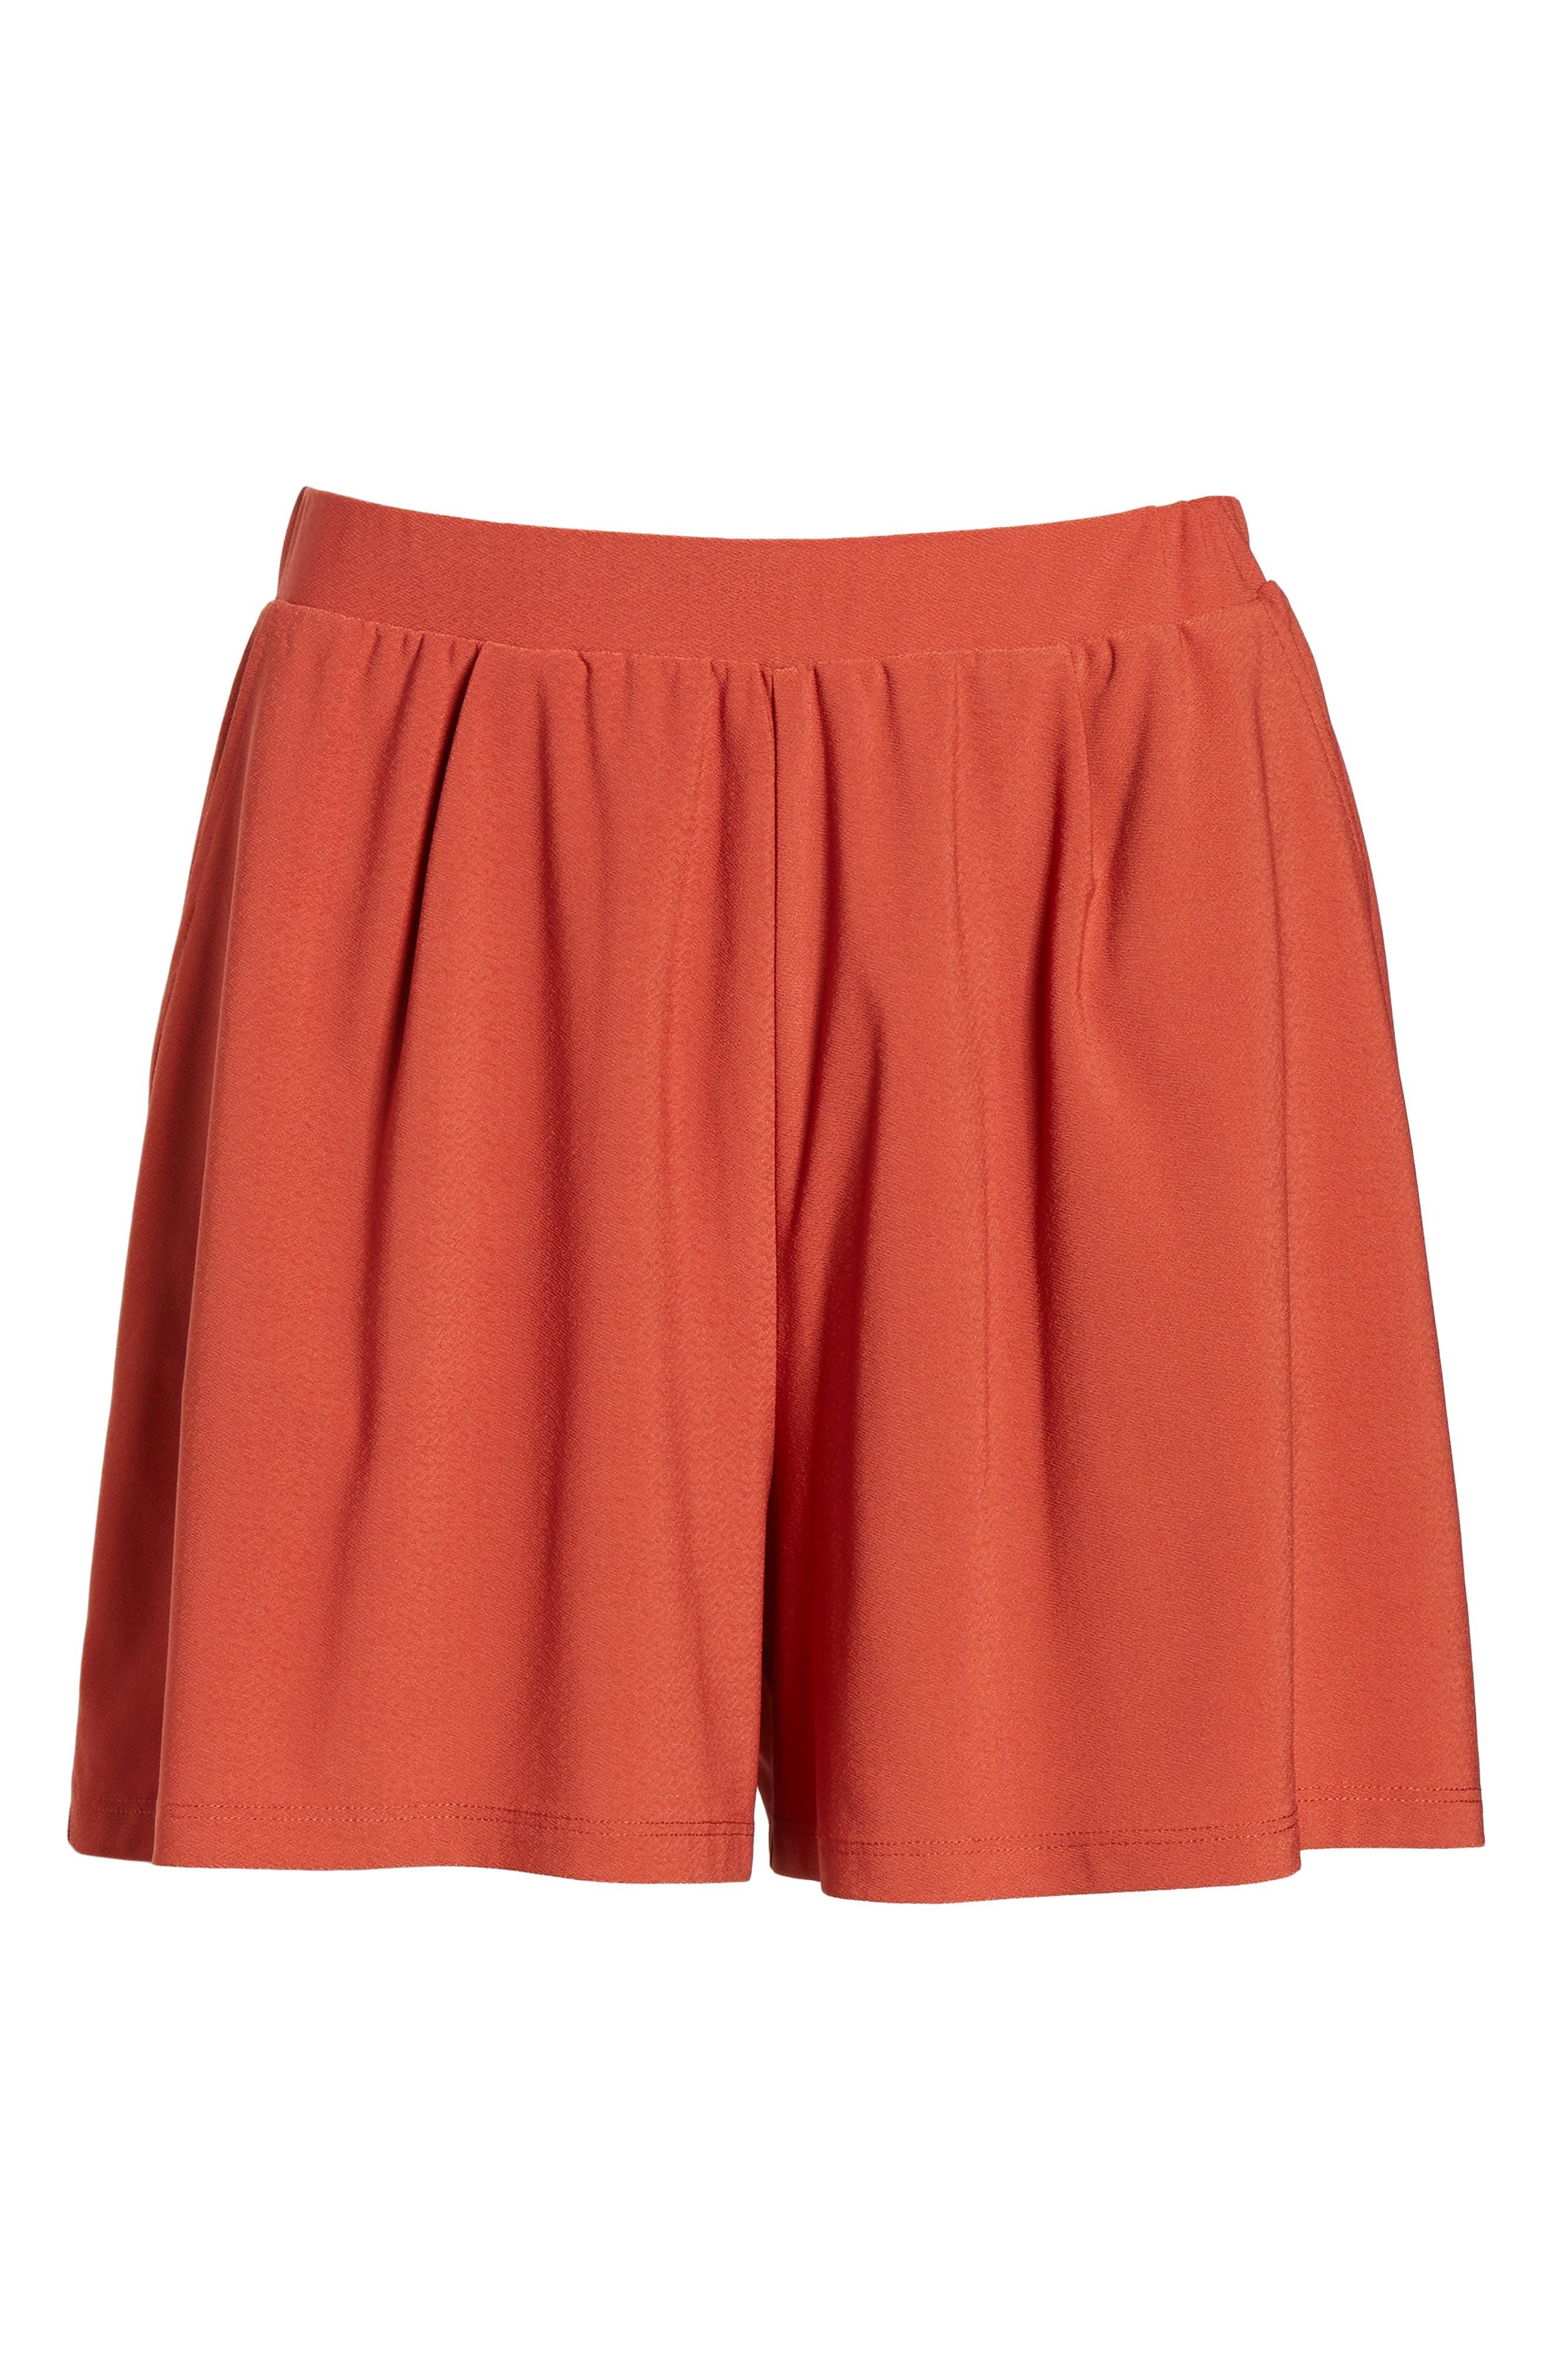 Pleat Front Shorts,                             Alternate thumbnail 6, color,                             Rust Bossa Nova